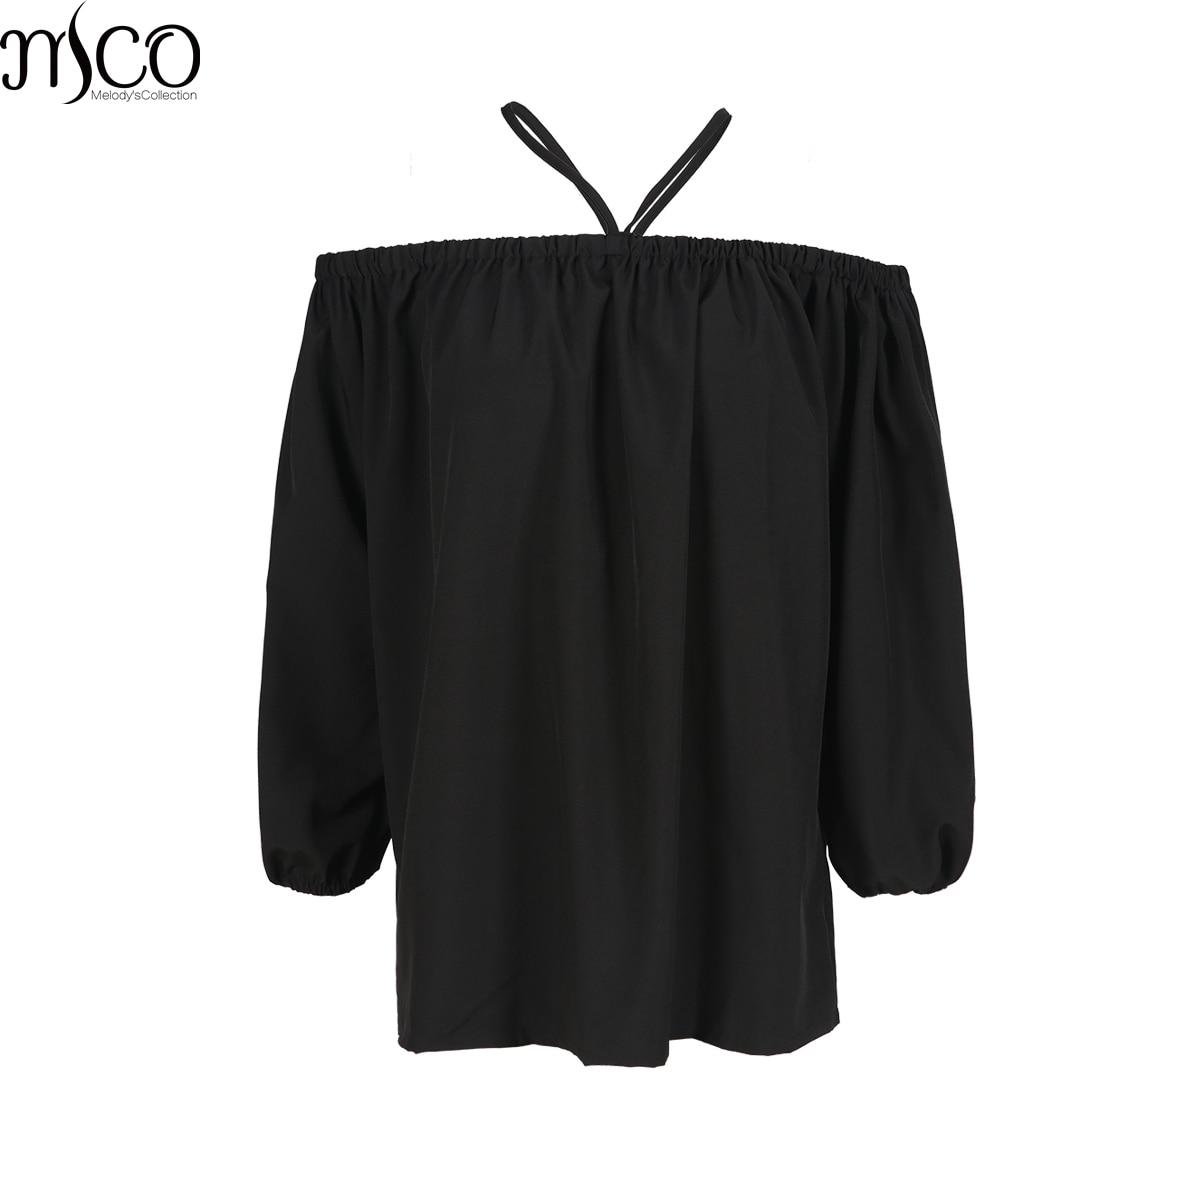 MCO 2017 Autumn Sexy Off Shoulder Plus Size Bardot Top Casual Oversized Halter Strap Shirt Basic Big Women Clothing 5xl 6xl 7xl